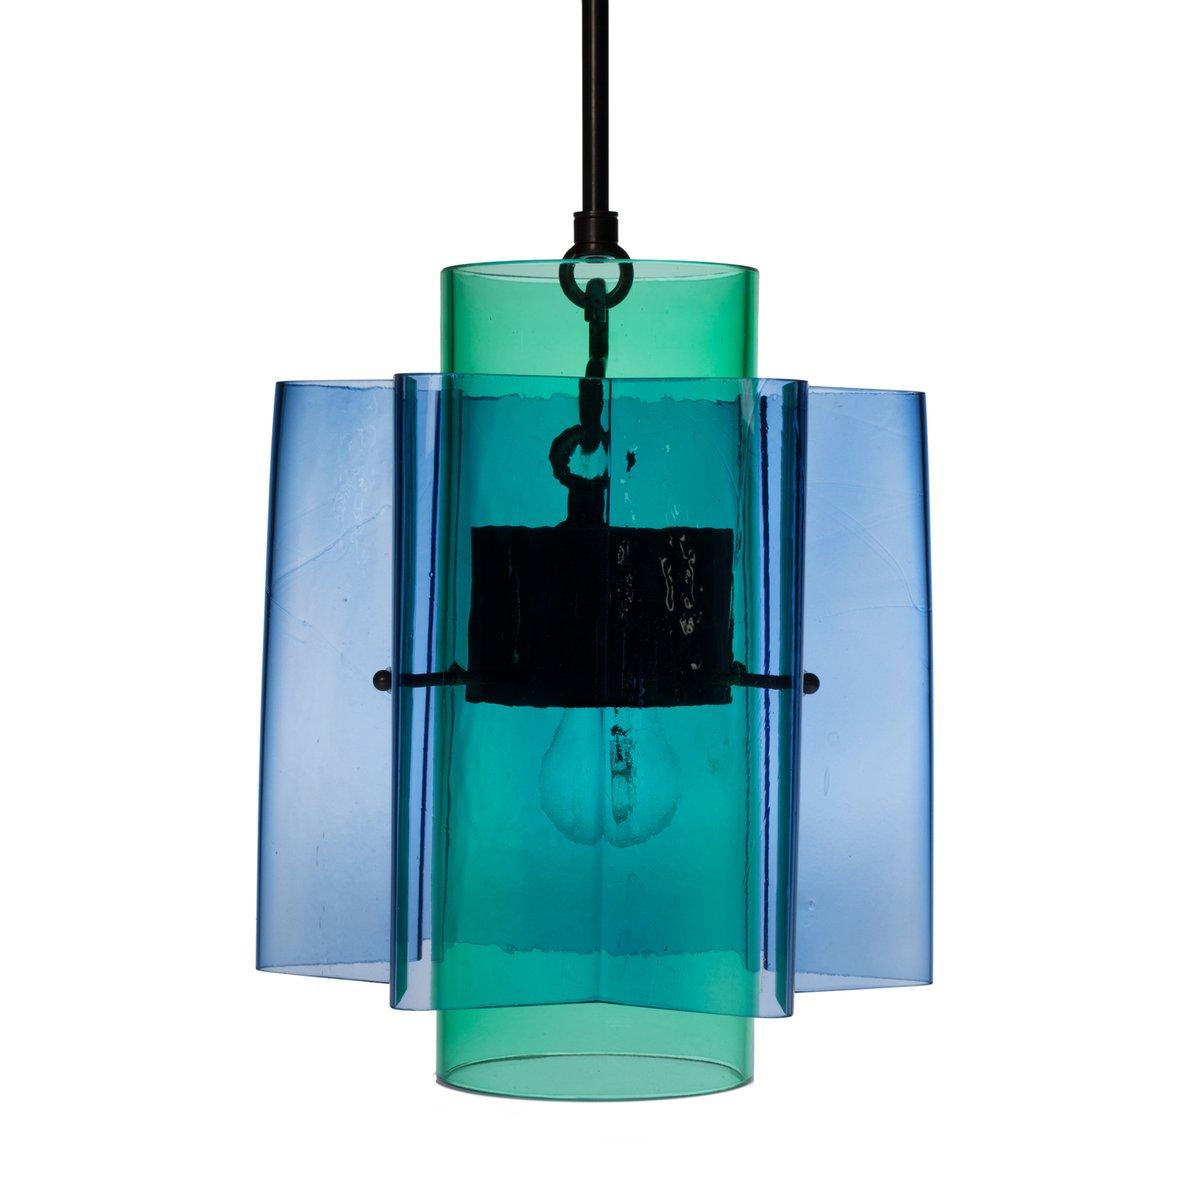 Sternförmige Petrona Hängelampe aus mundgeblasenem Glas in Blau & Grün...